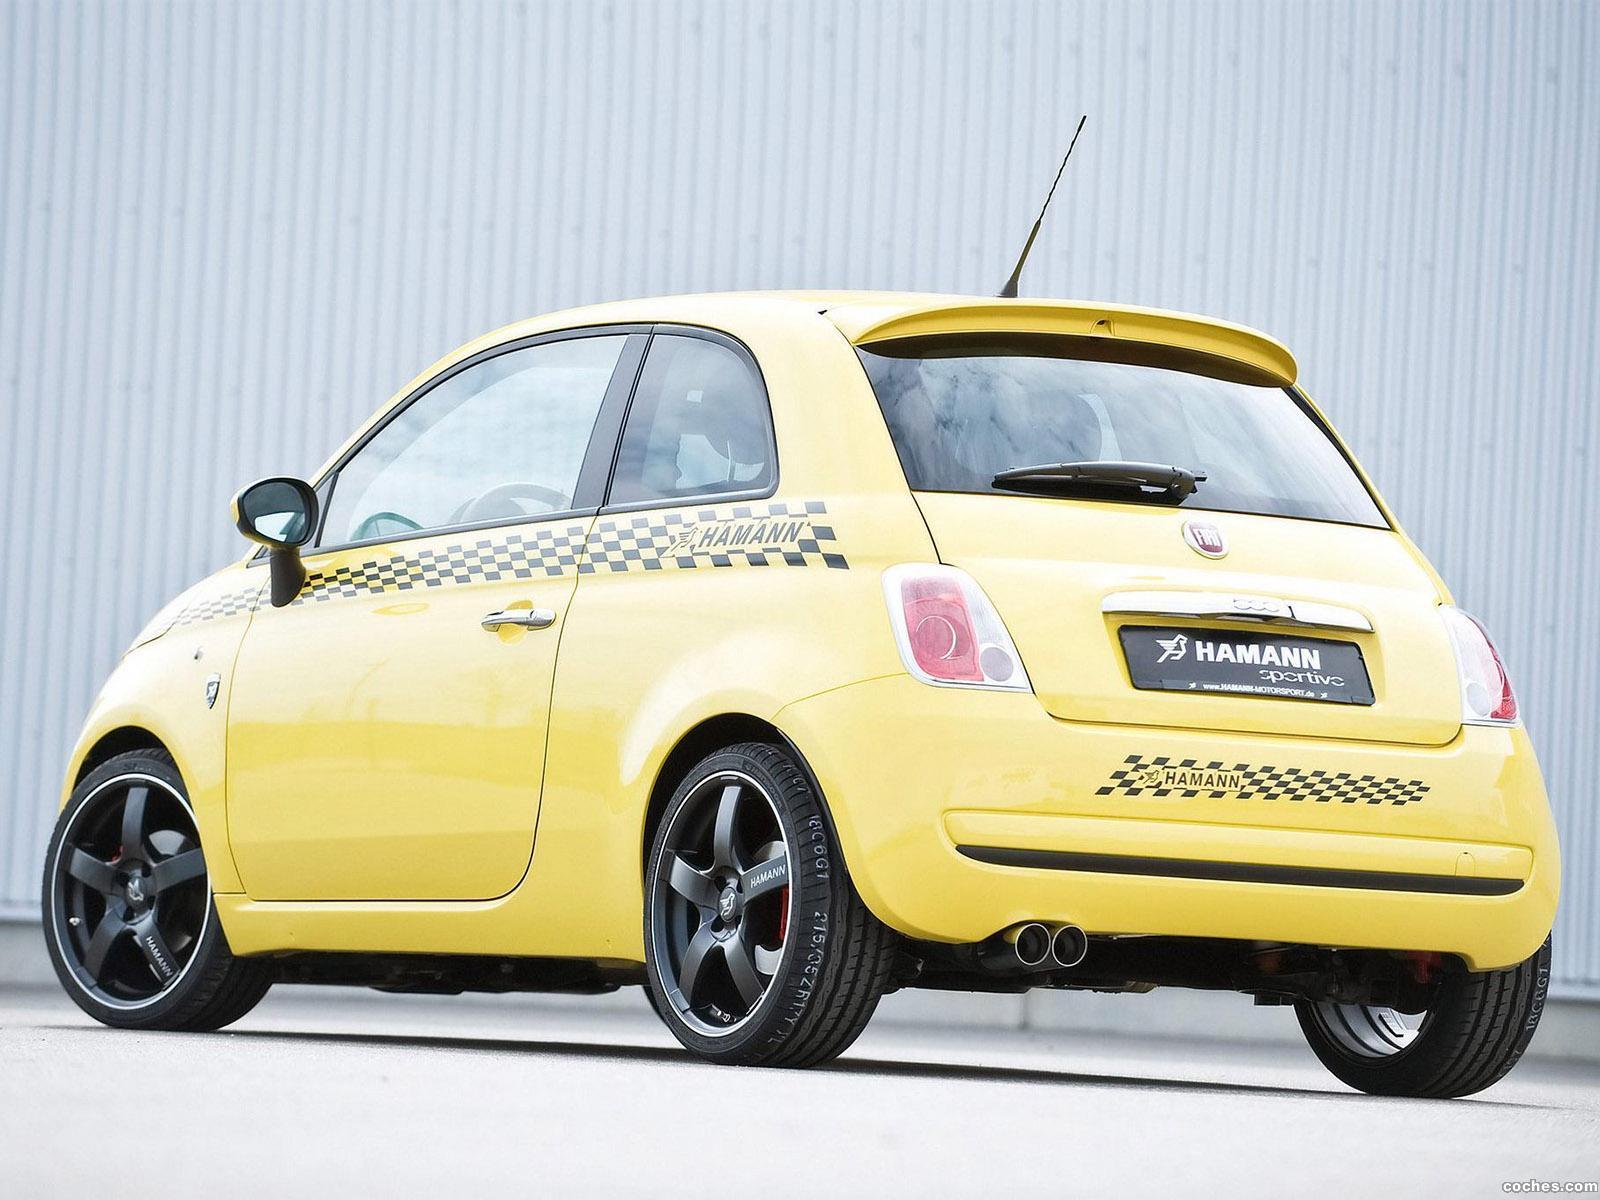 Foto 6 de Fiat Hamann 500 Sportivo 2008